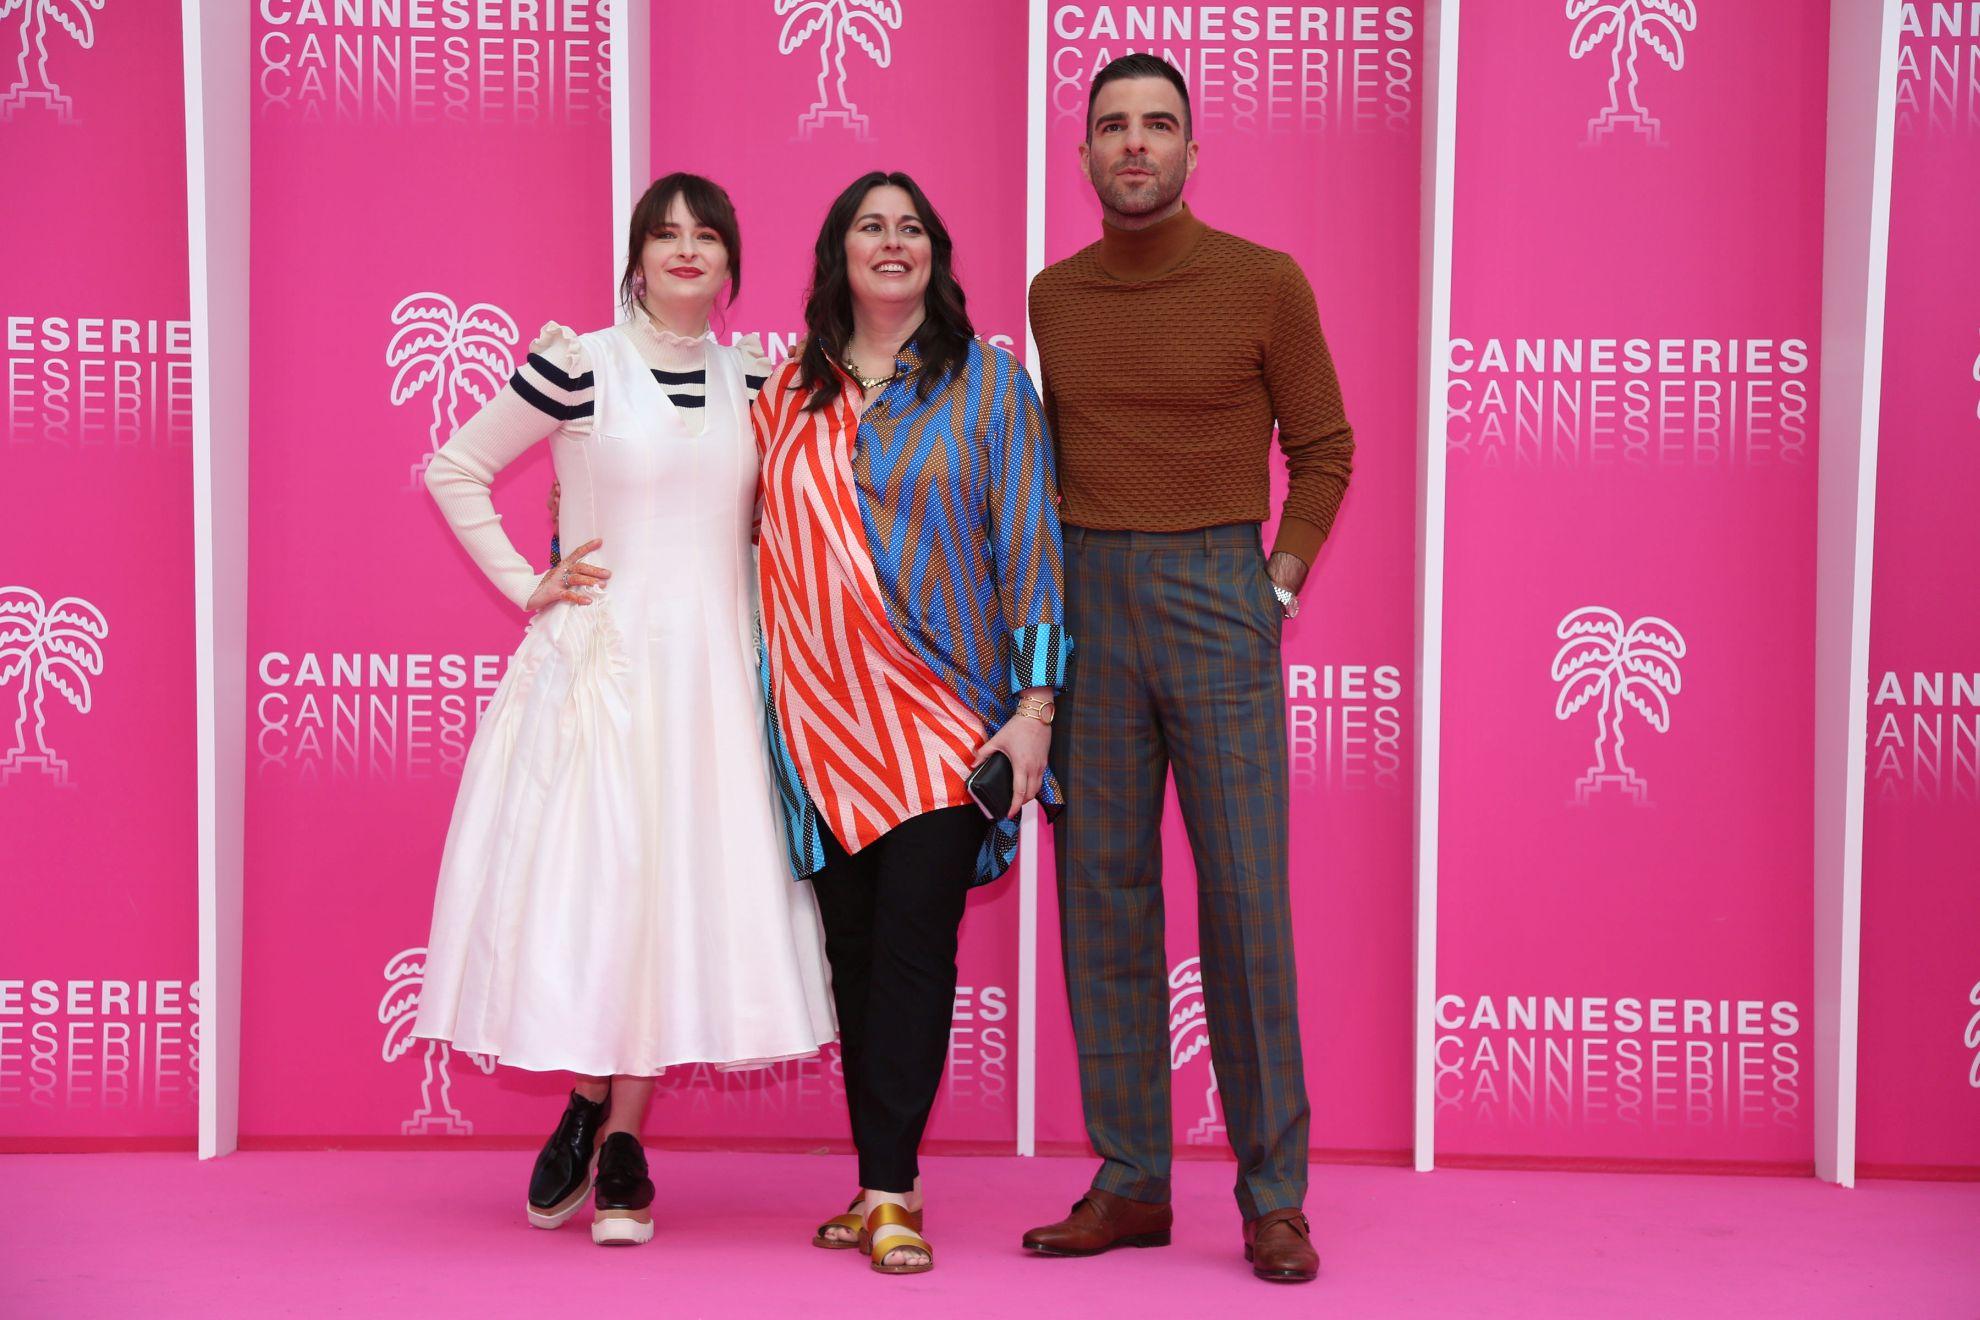 Canneseries 2019: il cast di NOS4A2 in posa per i fotografi sul pink carpet